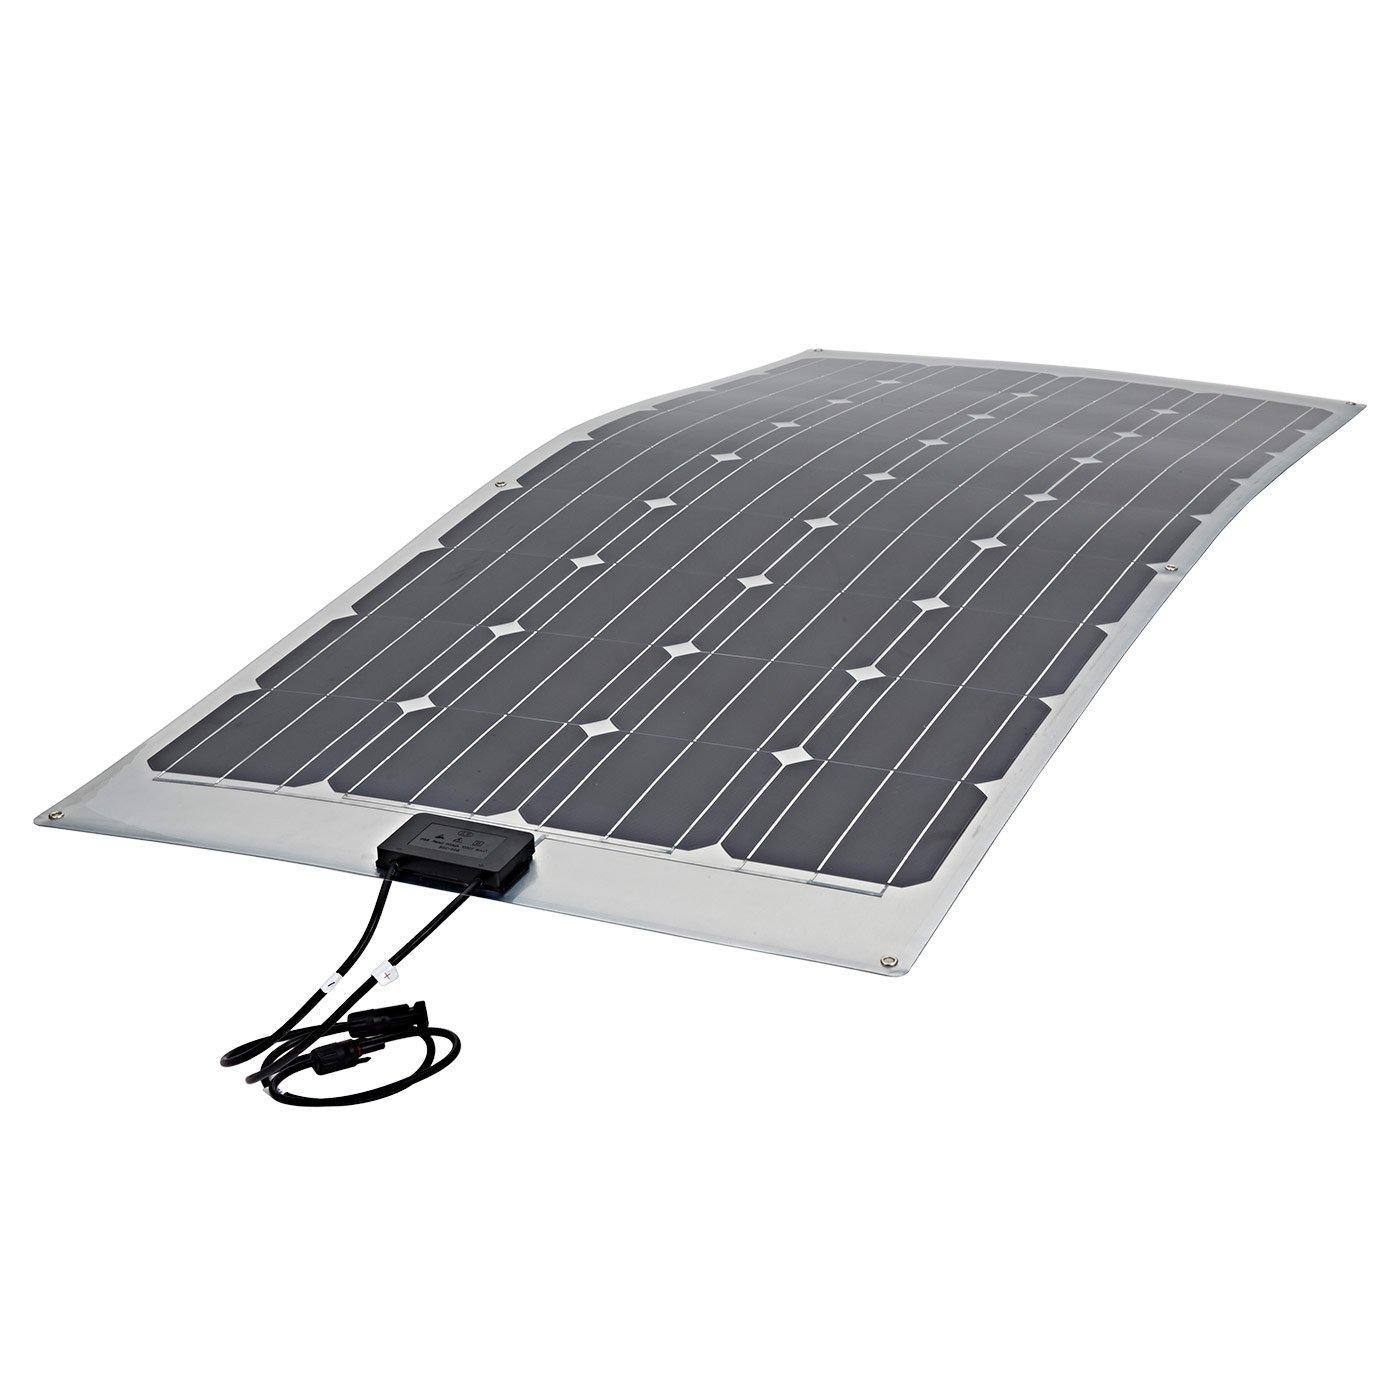 biard 150w solarpanel photovoltaik solarmodul. Black Bedroom Furniture Sets. Home Design Ideas